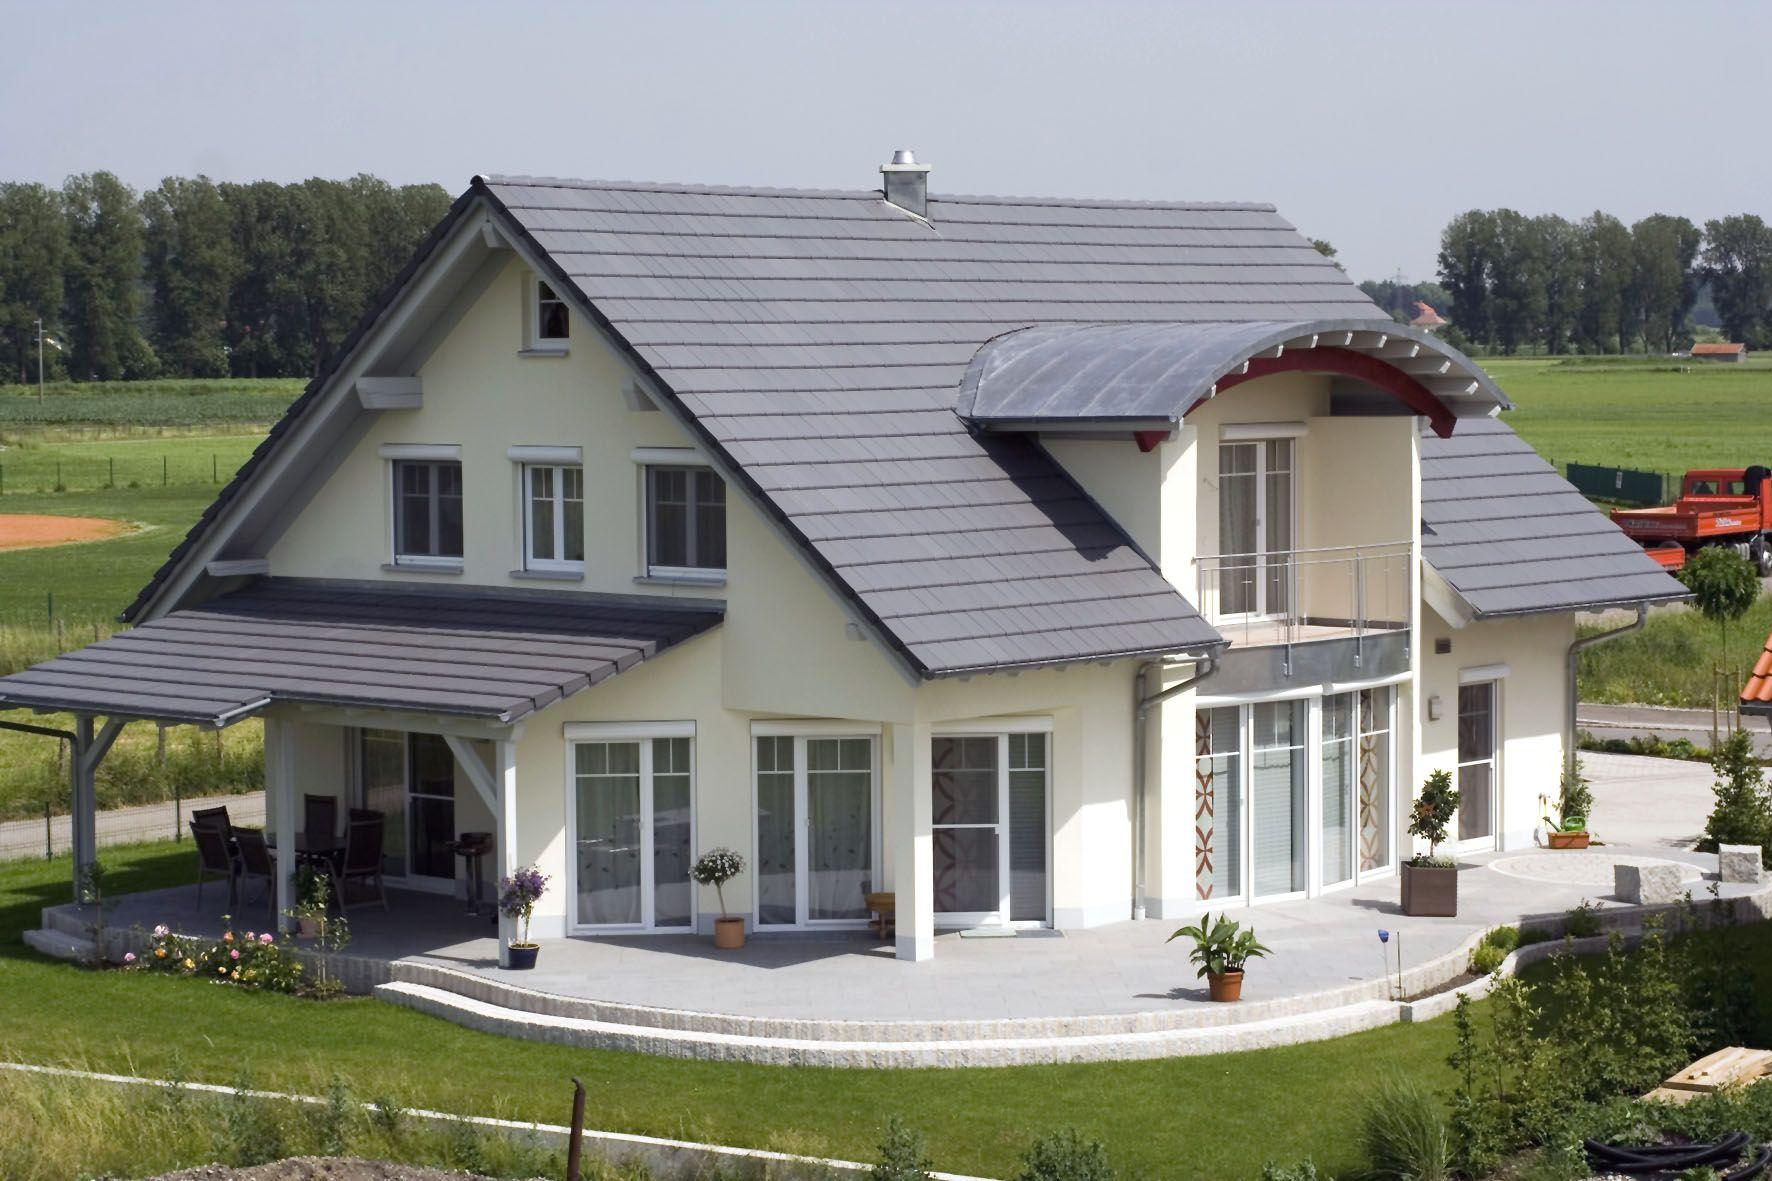 http//www.ratgeberzentrale.de/uploads/tx_news/15946_21131